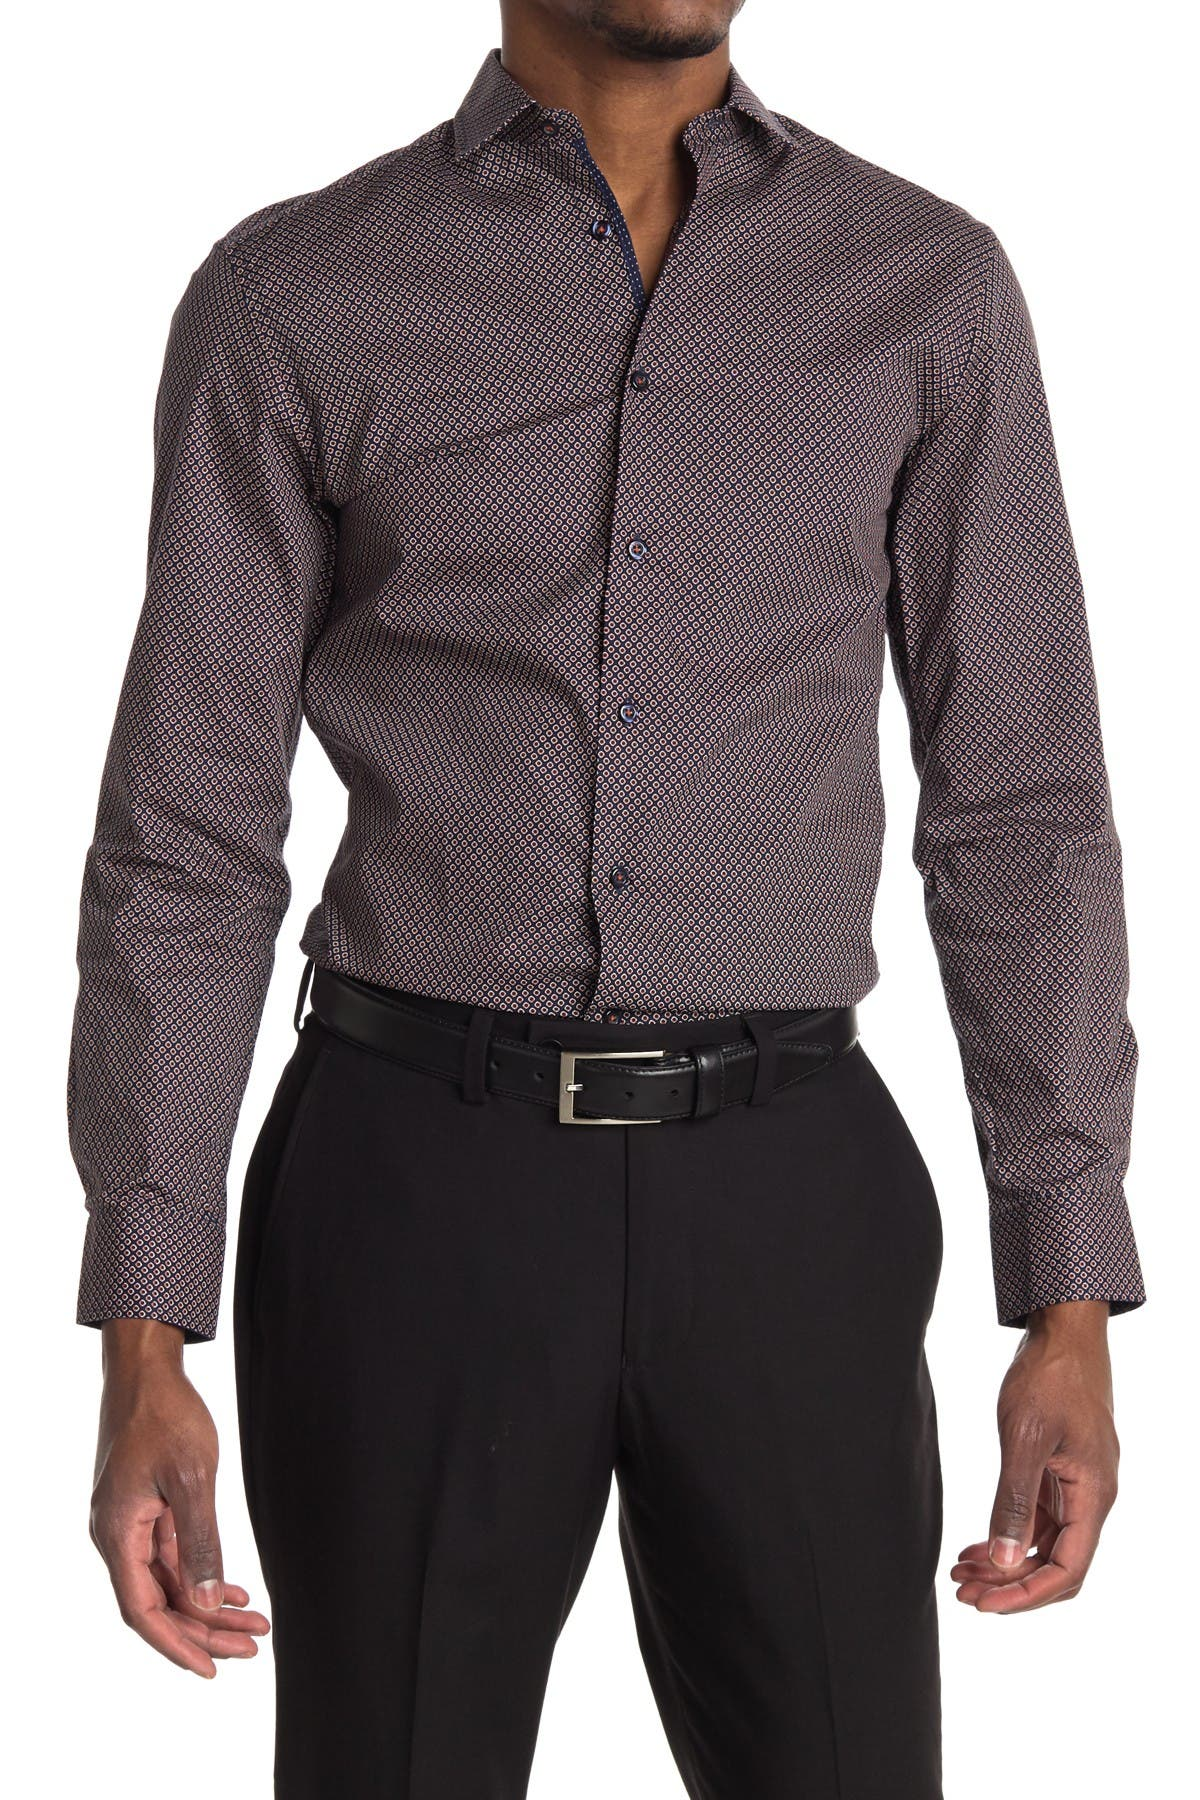 Image of SOUL OF LONDON Micro Print Dress Shirt